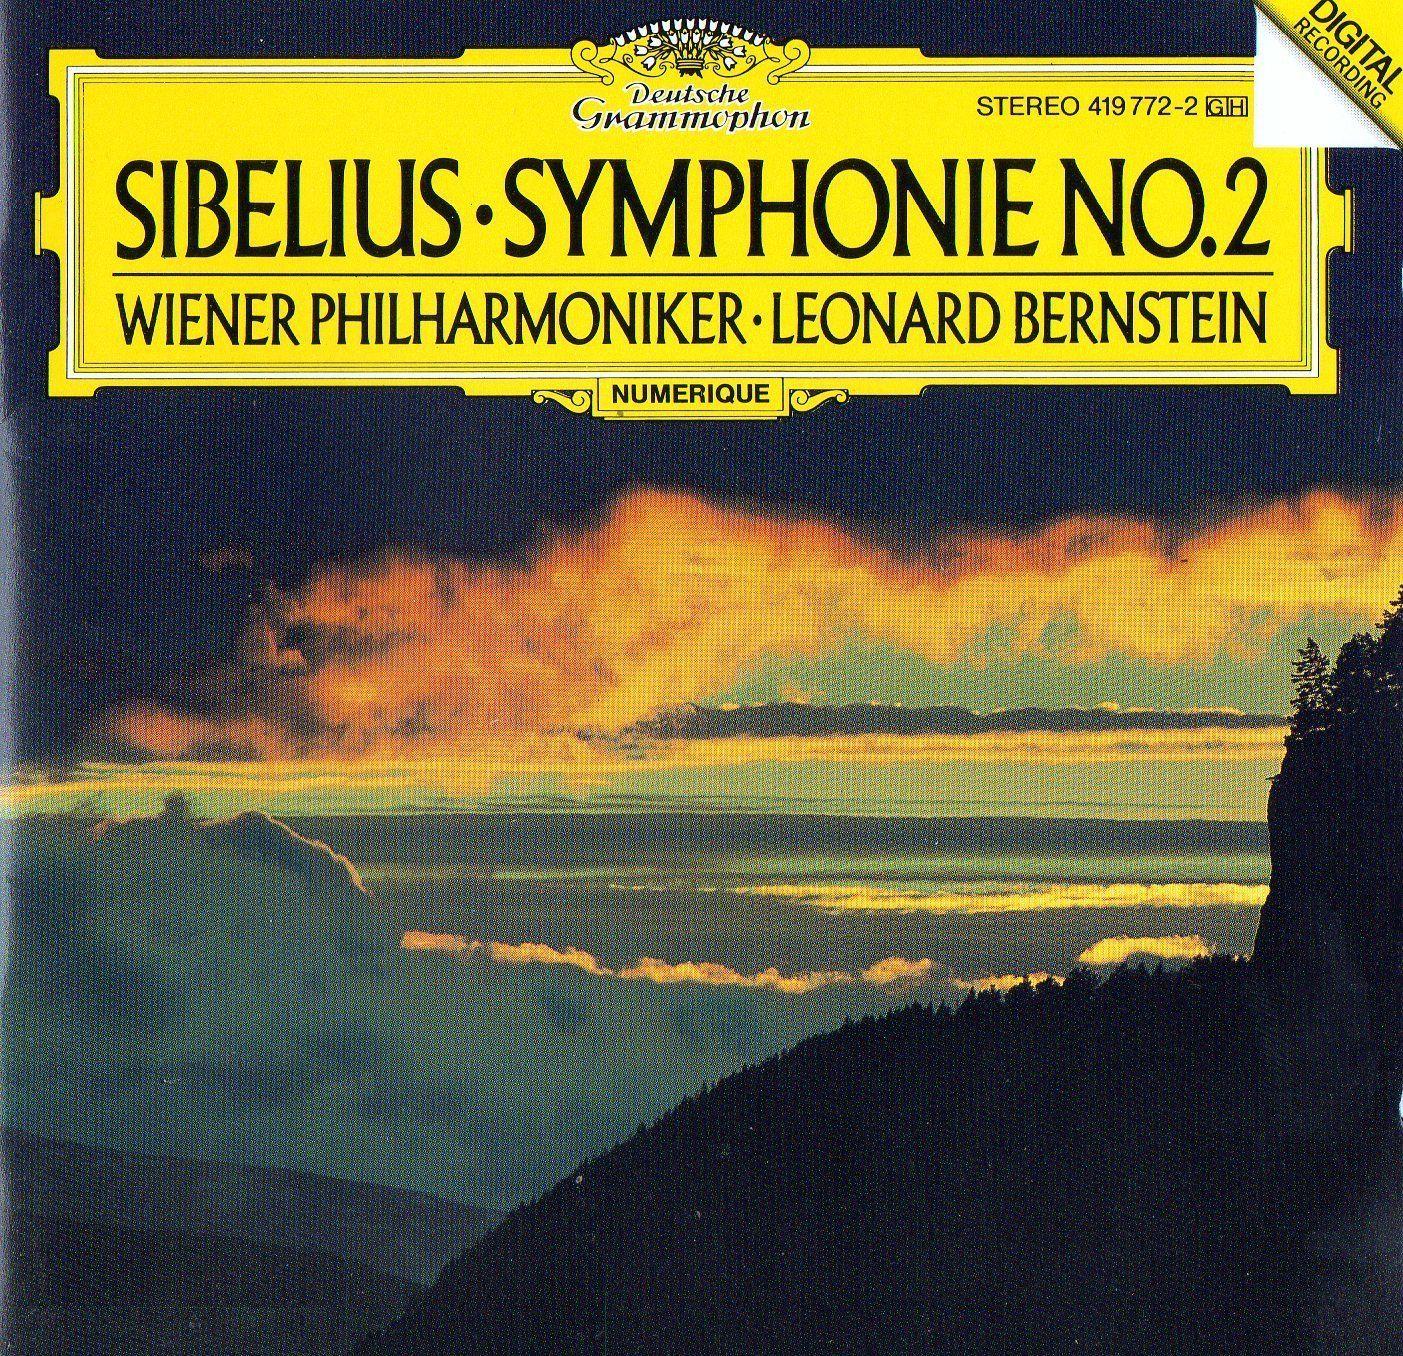 Vienna Philharmonic / Leonard Bernstein // DGG 419 7722 - Recorded 1987